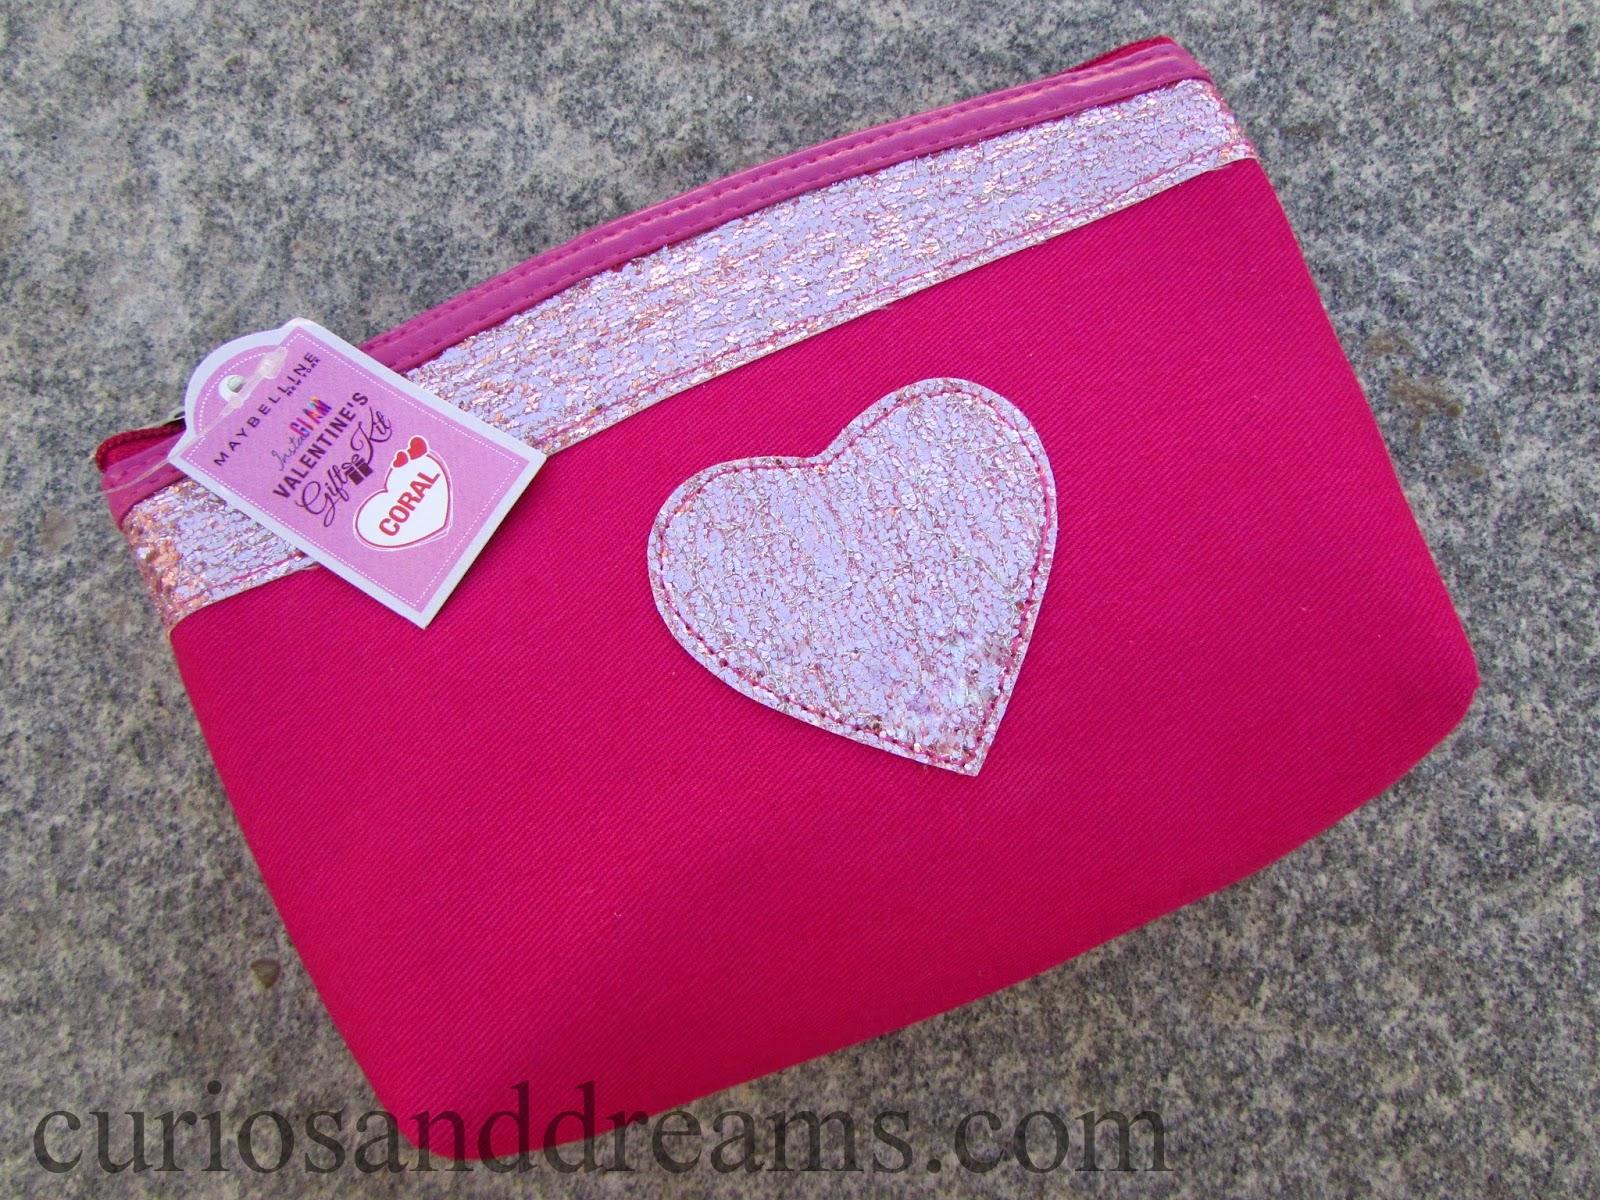 Maybelline Instaglam Valentine's Gift Kit, Maybelline Instaglam Valentine's Gift Kit review, Maybelline Instaglam Valentine's Gift Kit coral